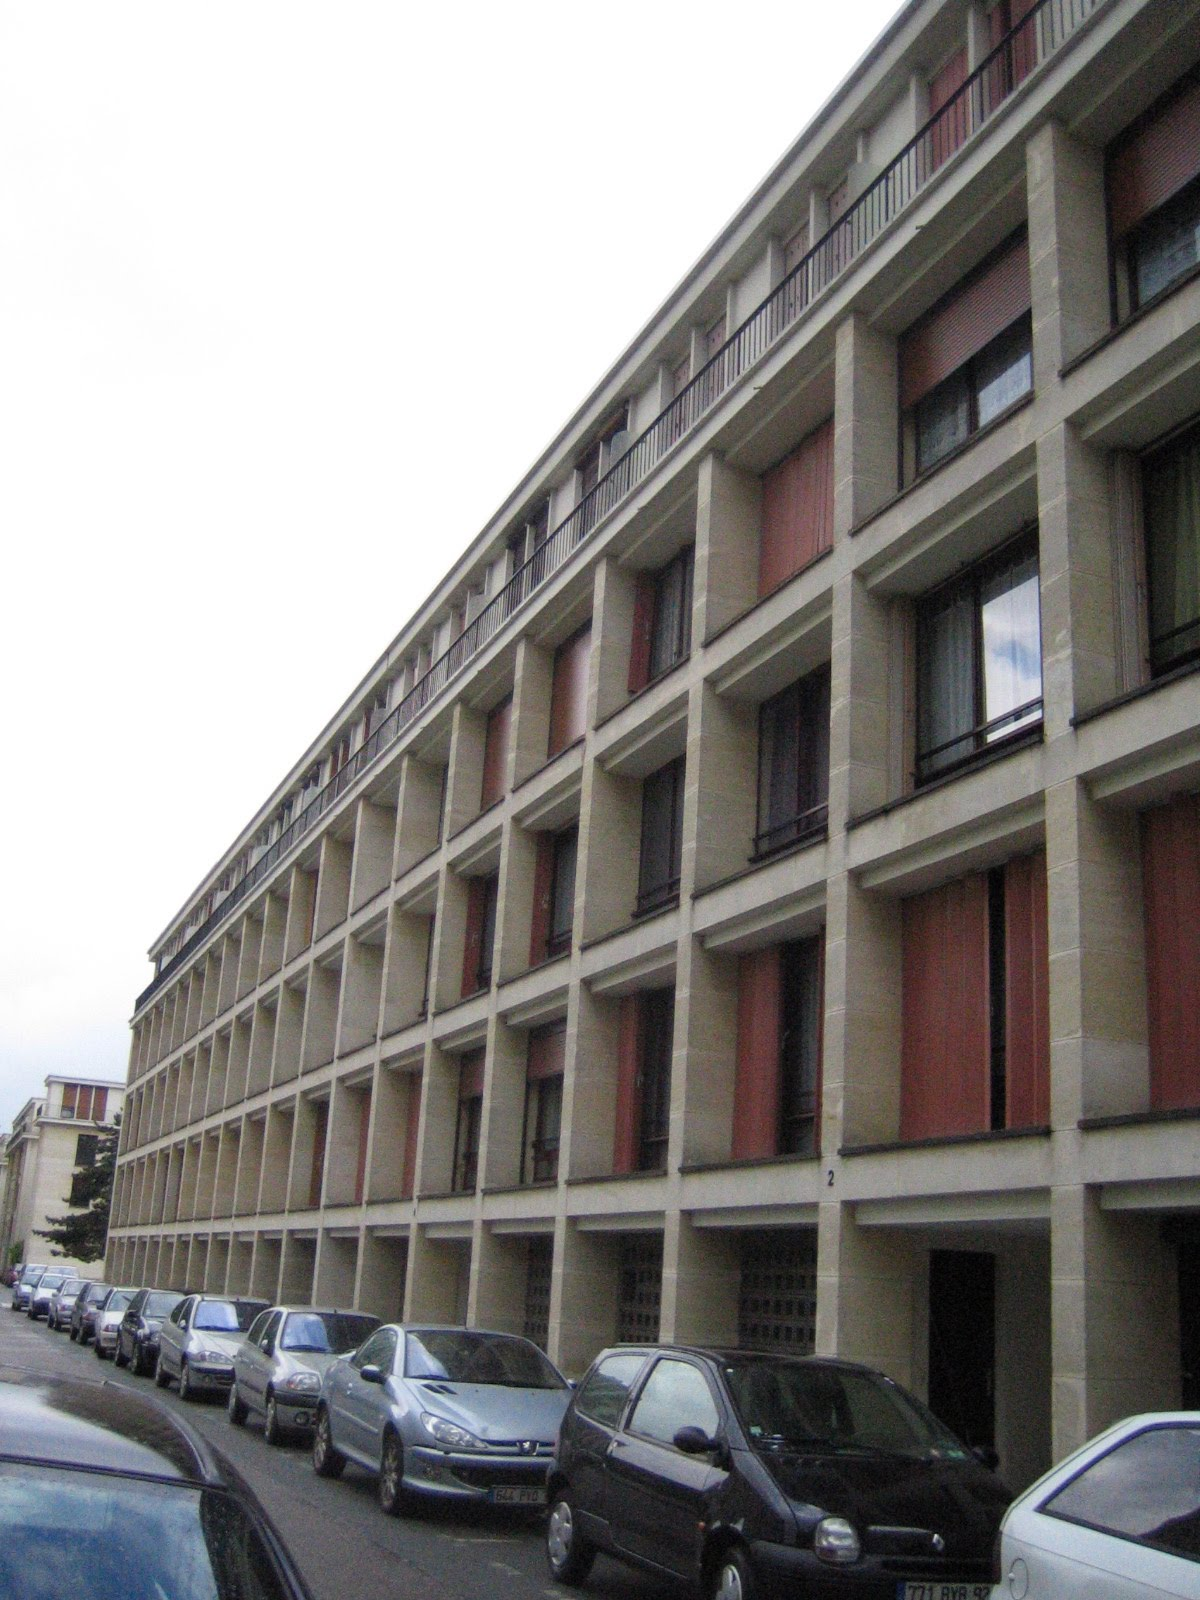 Architectural hints le havre auguste perret 1945 for 3d architecture le havre